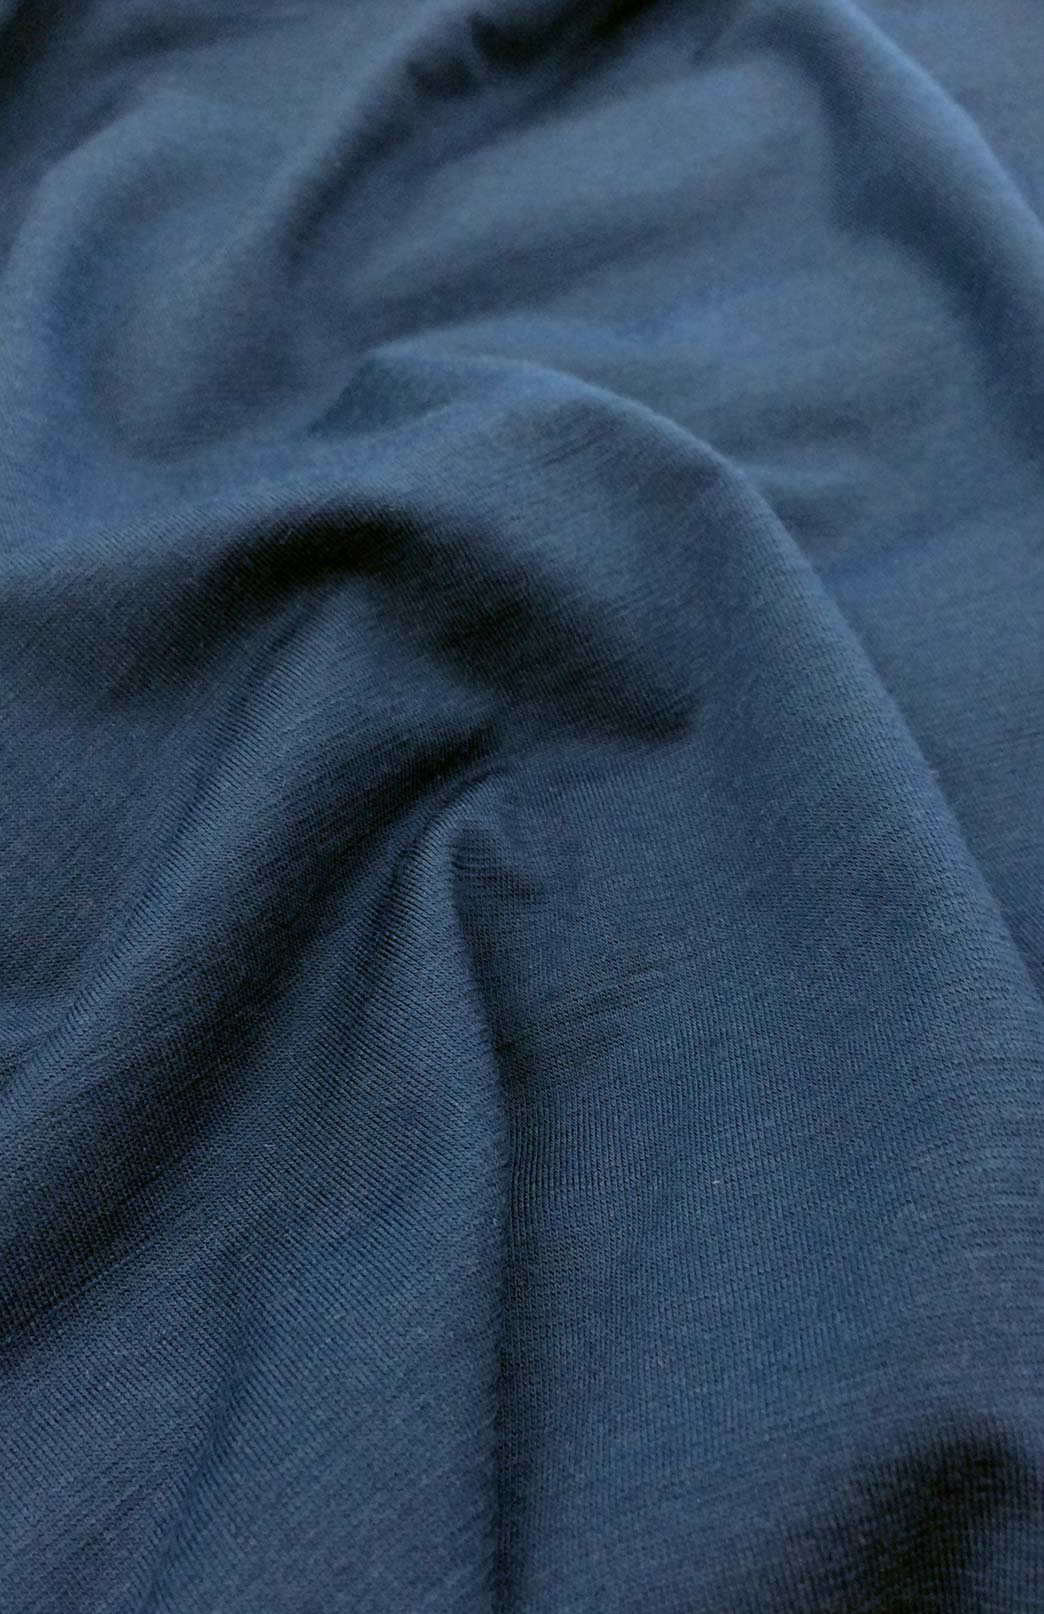 Fan Dress - Women's Merino Wool Indigo Blue Fan Dress with Empire Waistline and Flared Skirt - Smitten Merino Tasmania Australia